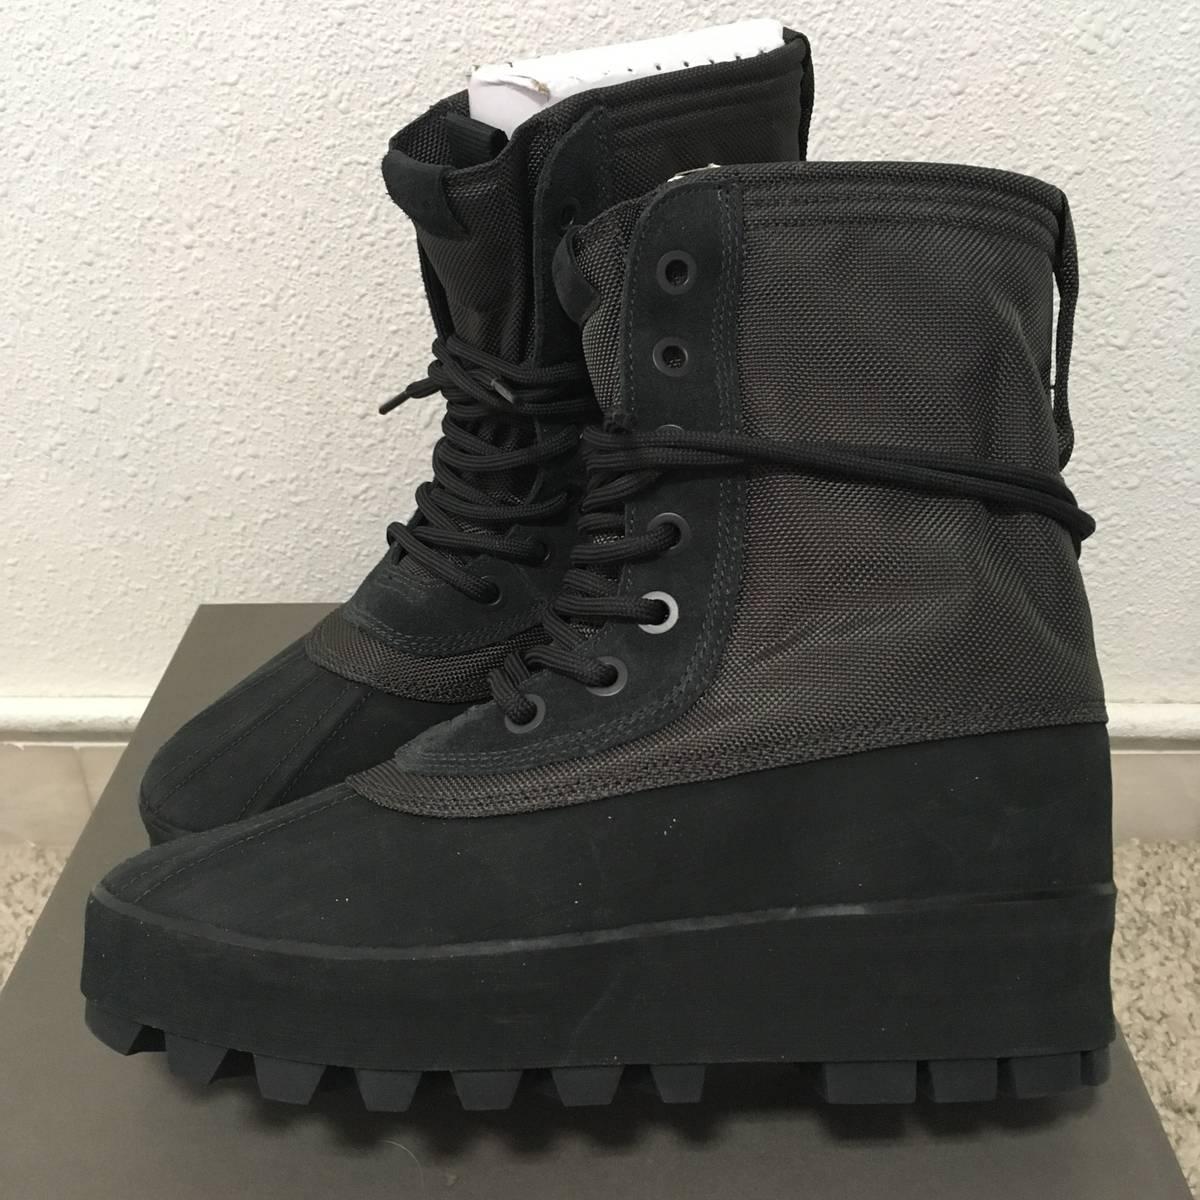 6908e06e4e8 Adidas × Kanye West Yeezy 950 M Pirate Black Size 7.5 $430